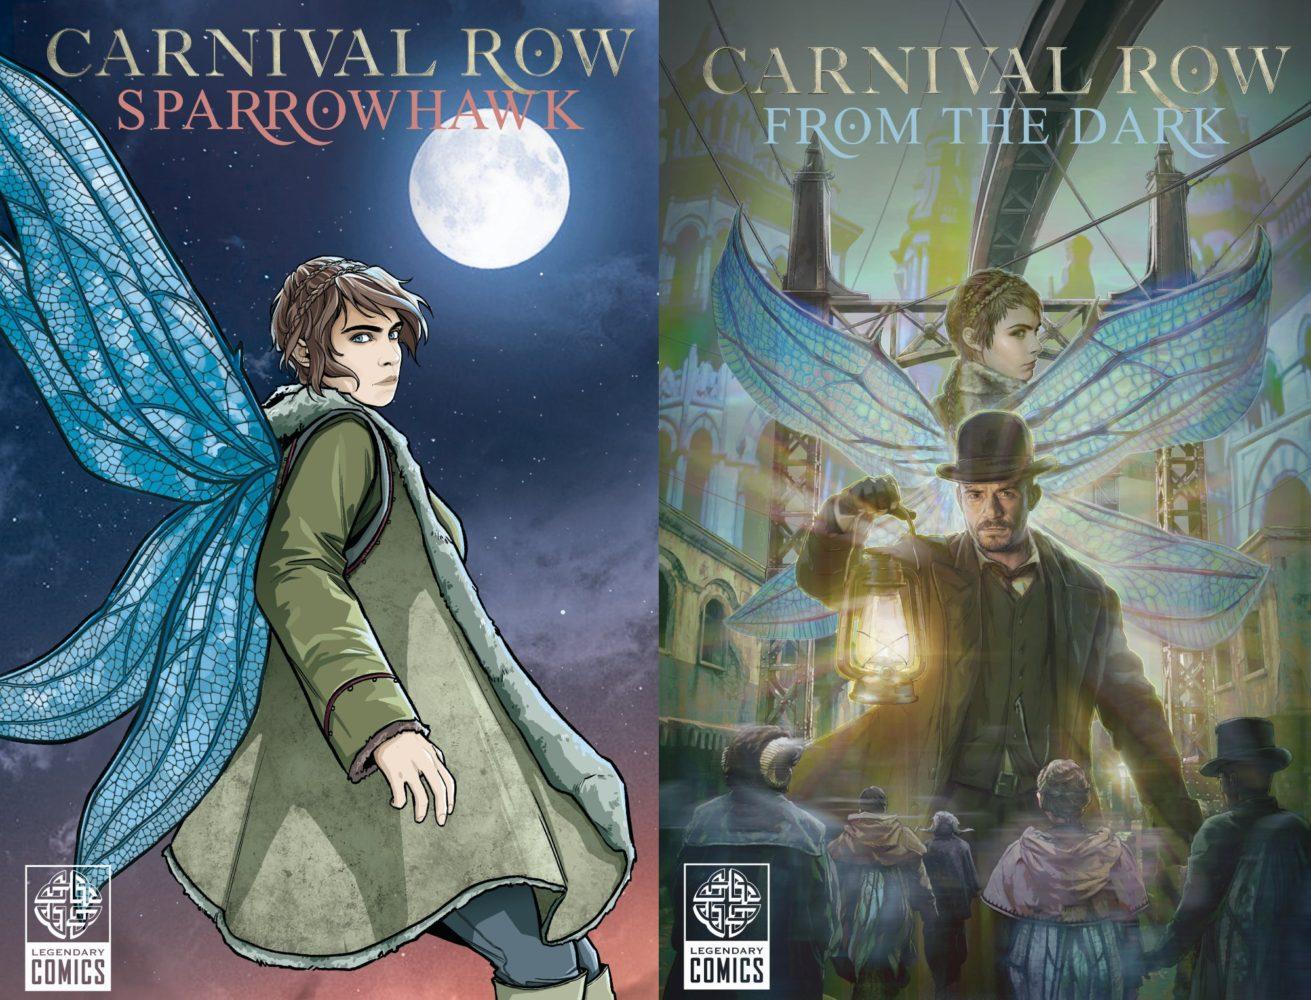 Carnival Row - Legendary Comics